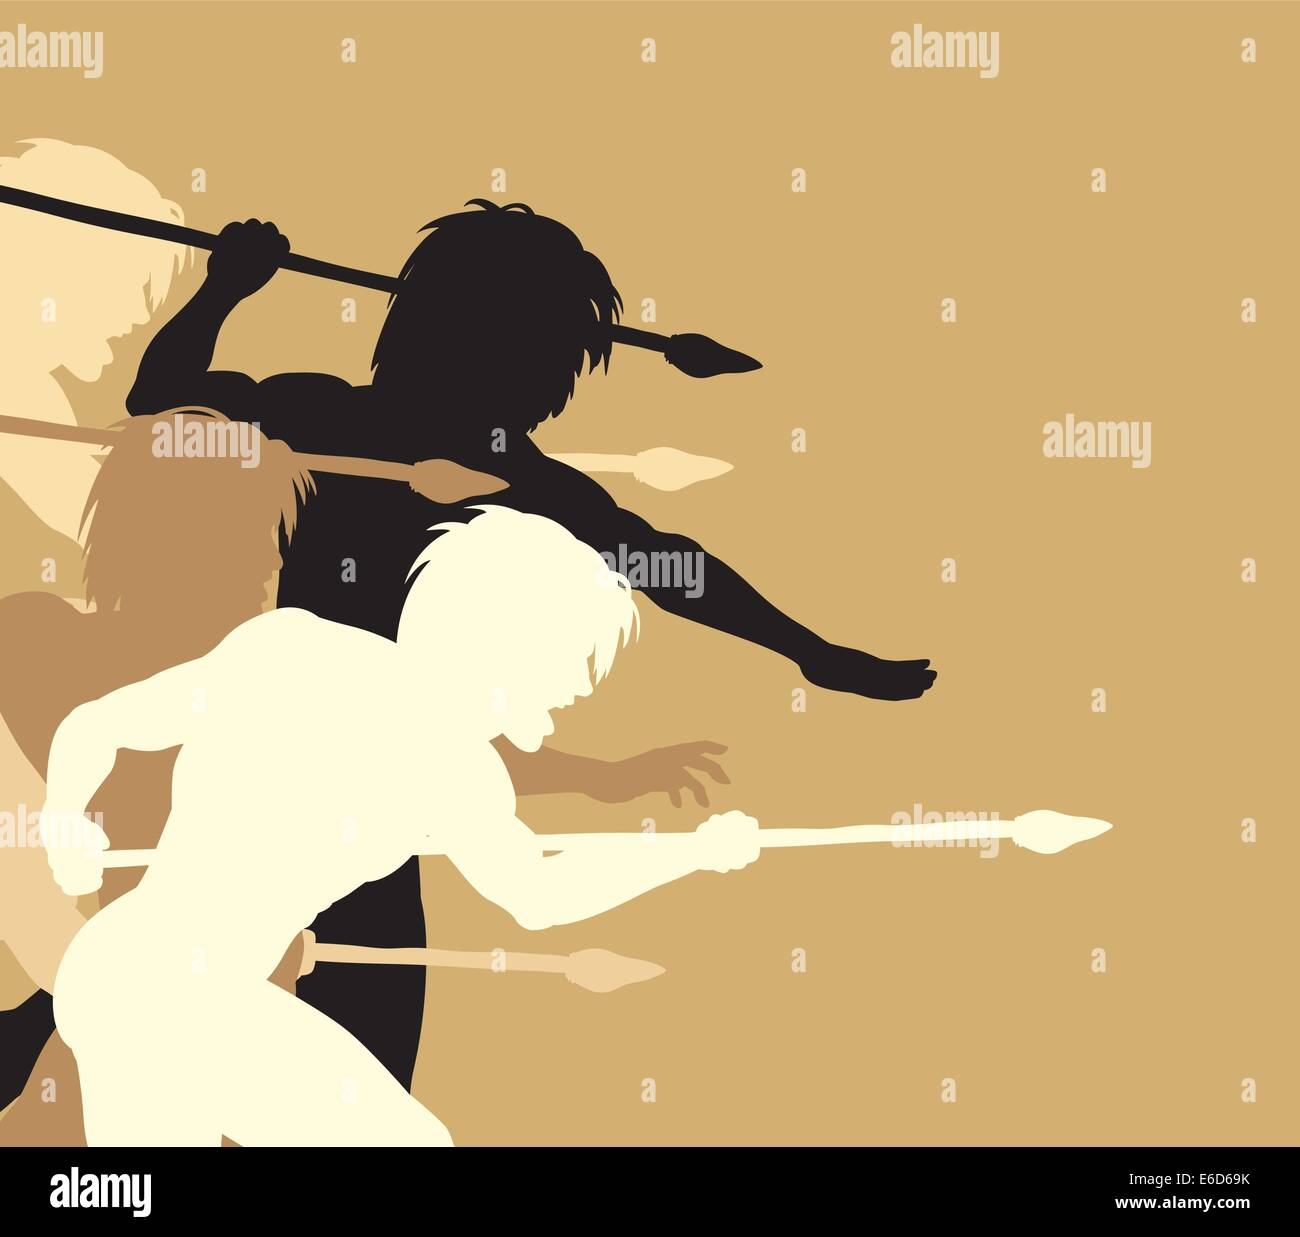 Editable vector silhouettes of cavemen holding spears threateningly - Stock Vector